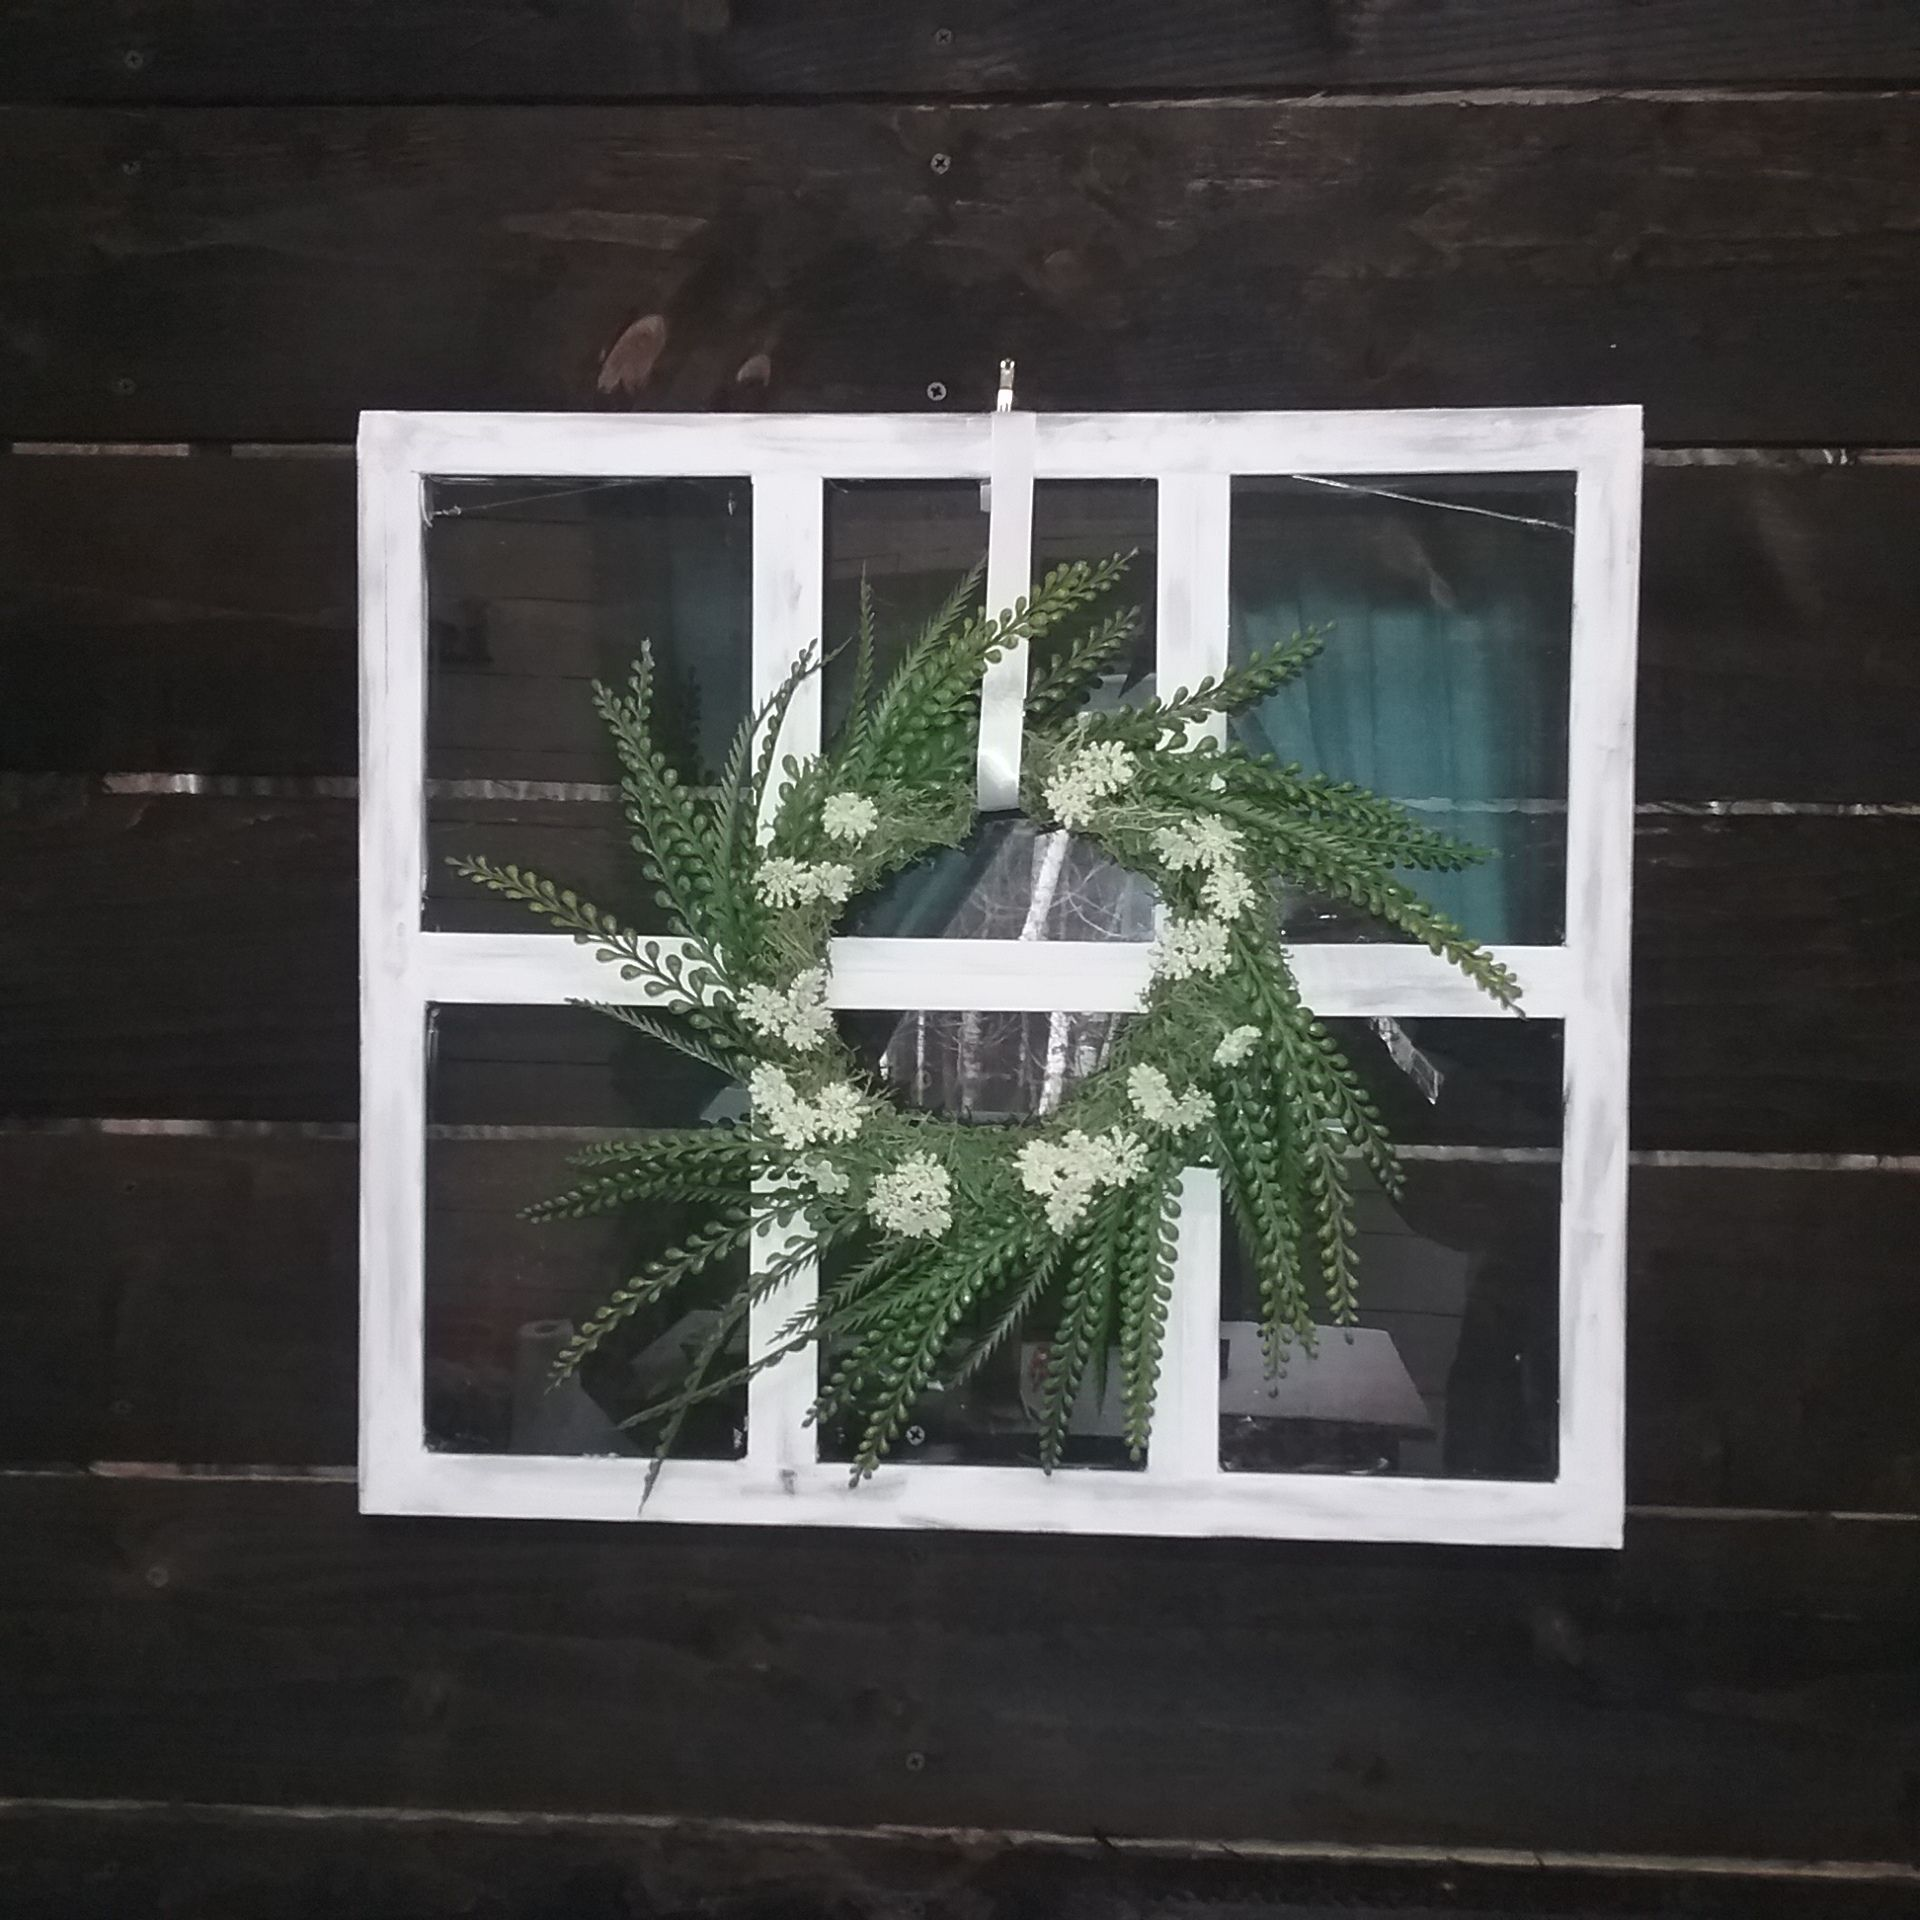 Dollar Tree Diy Farmhouse Window Frame And Wreath Dollar Tree Diy Crafts Picture Frame Crafts Dollar Tree Diy